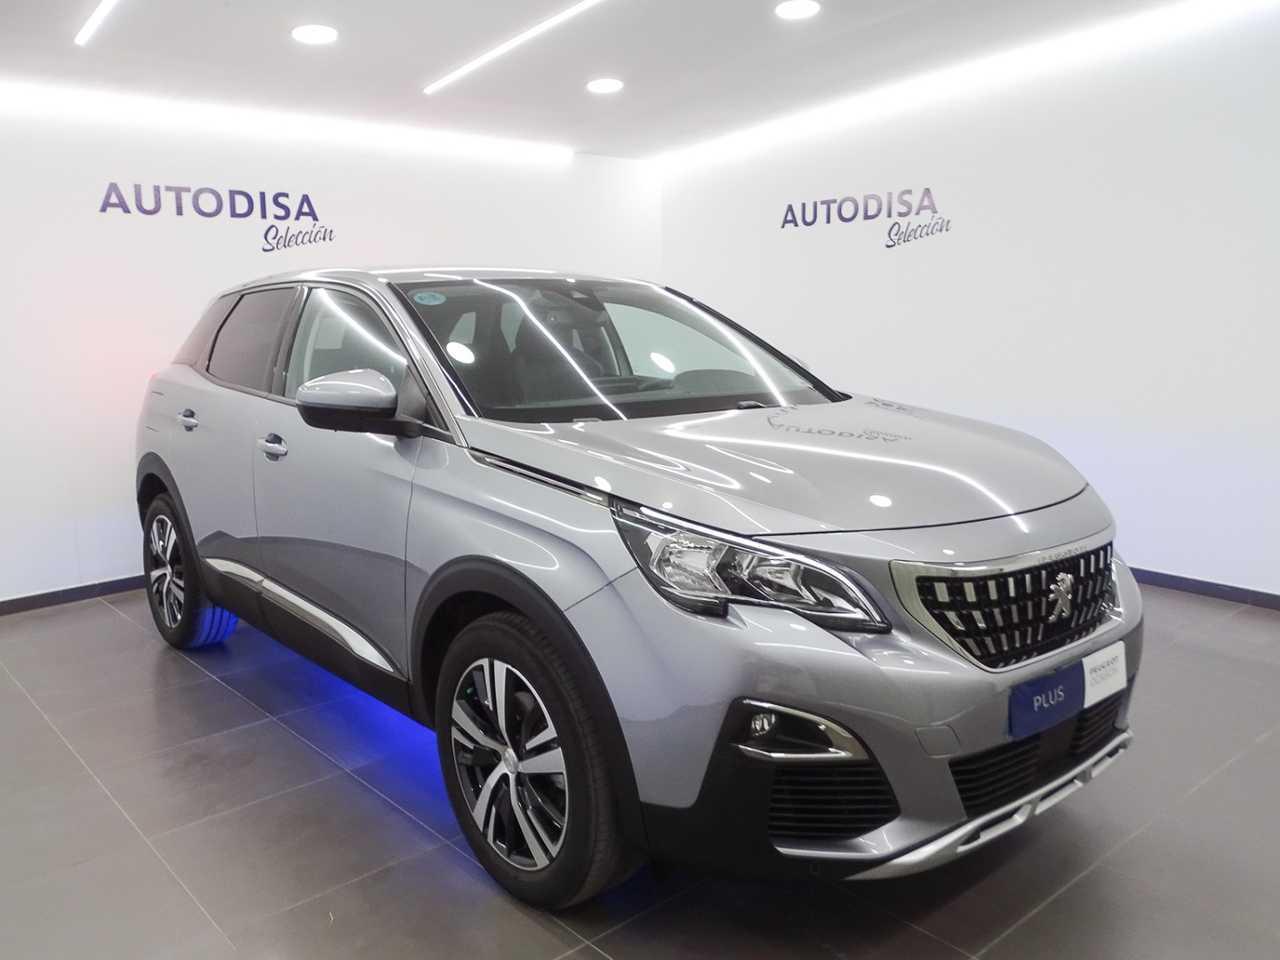 Peugeot 3008 1.2 PURETECH ALLURE S&S